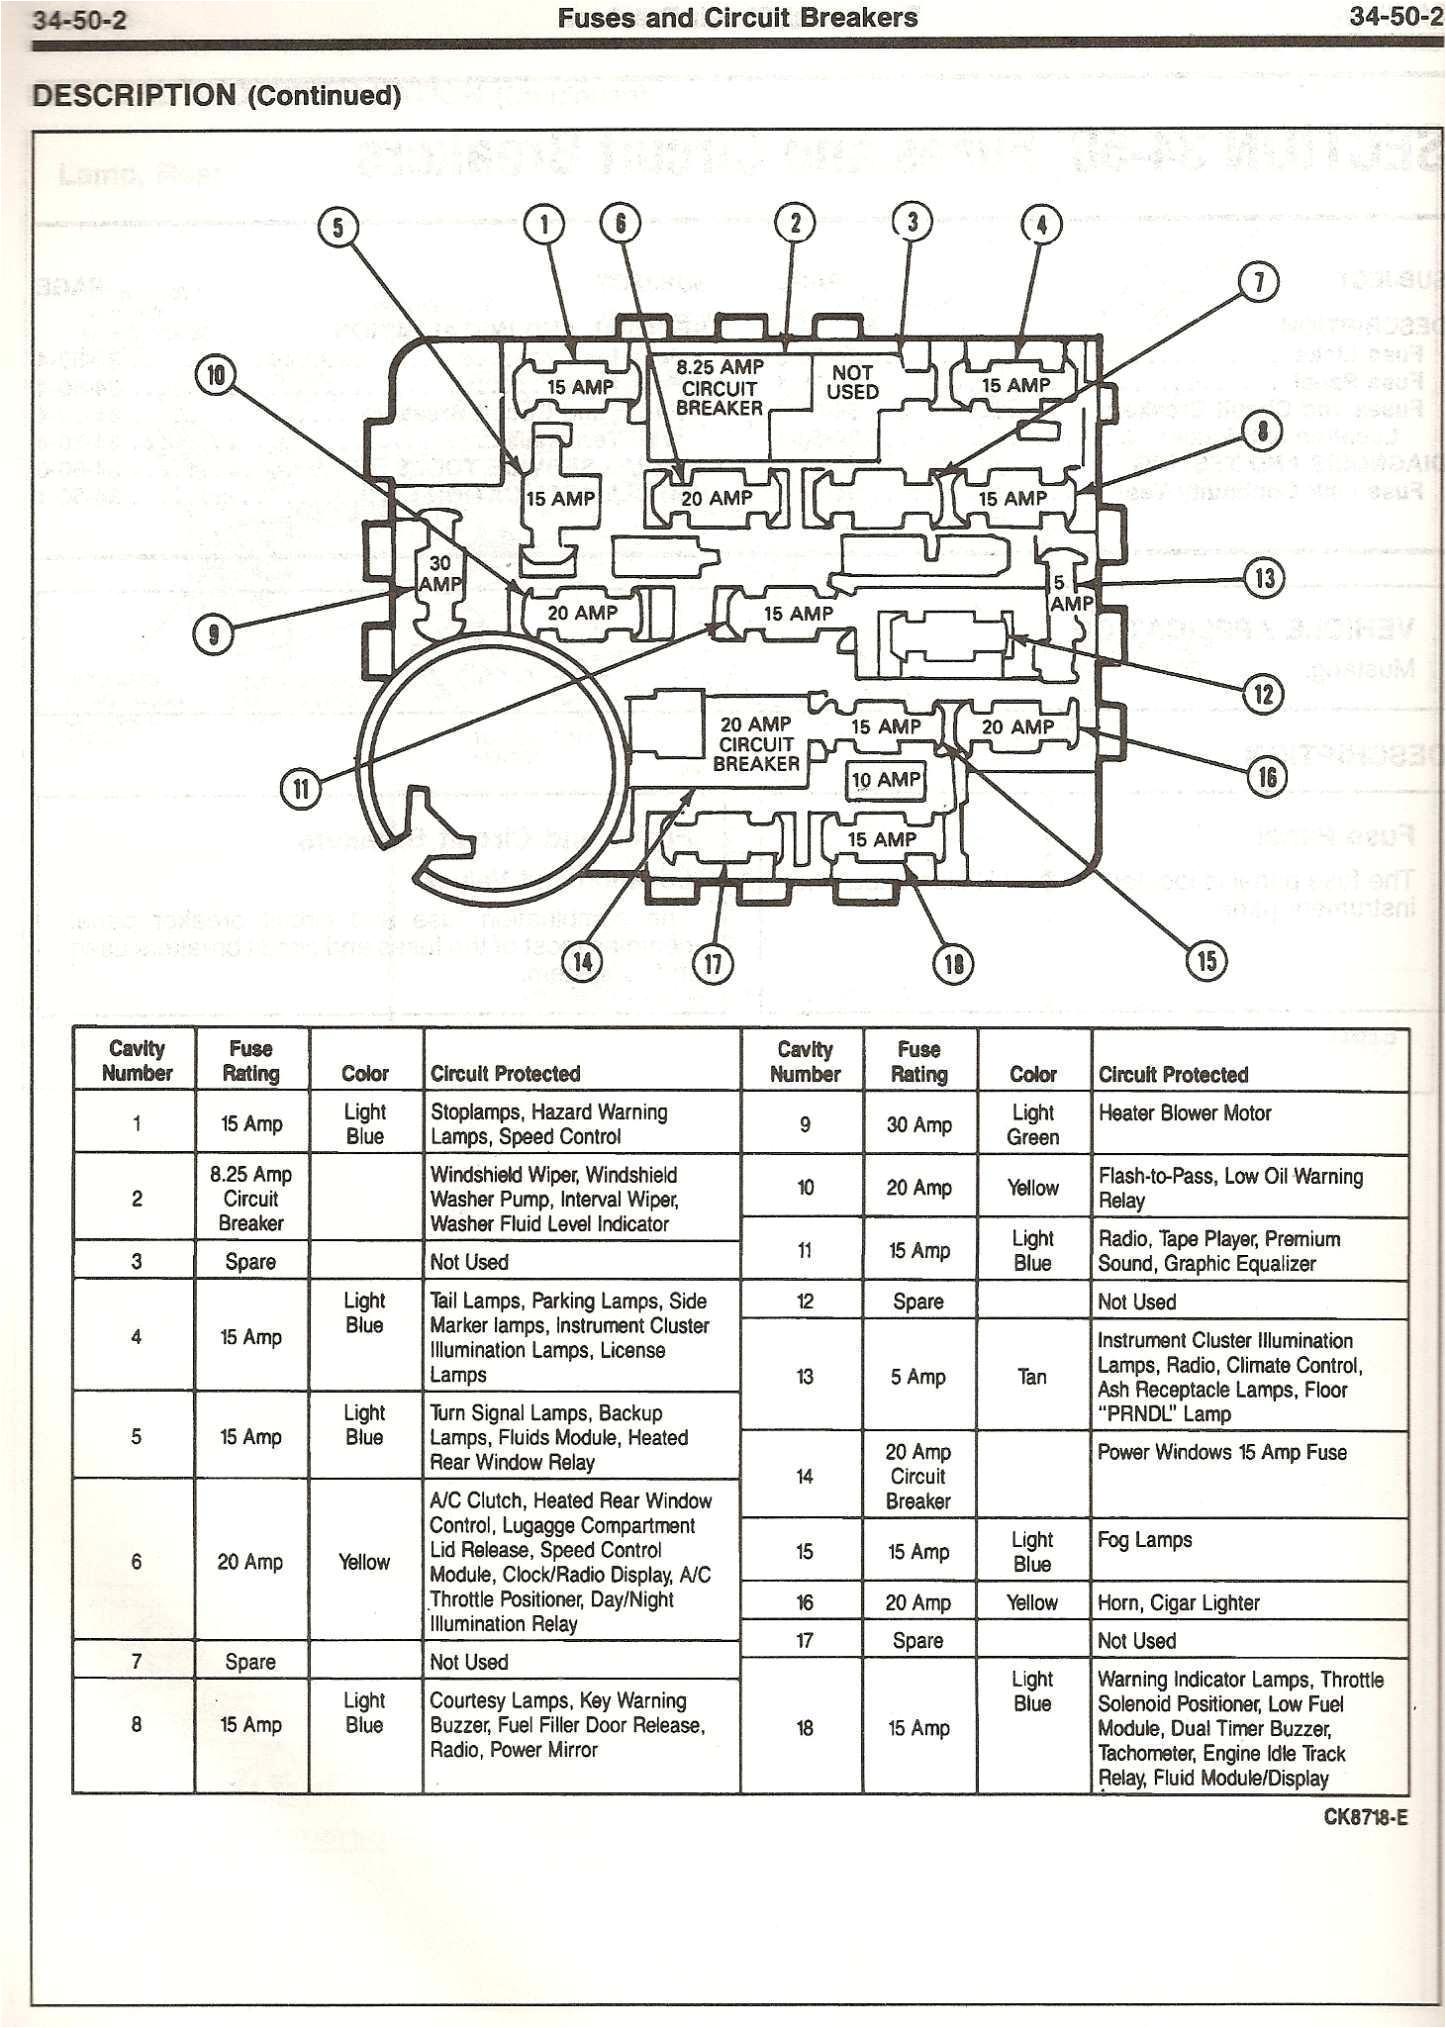 2012 ford fiesta fuse box wiring diagram database 2012 ford fiesta fuse box diagram